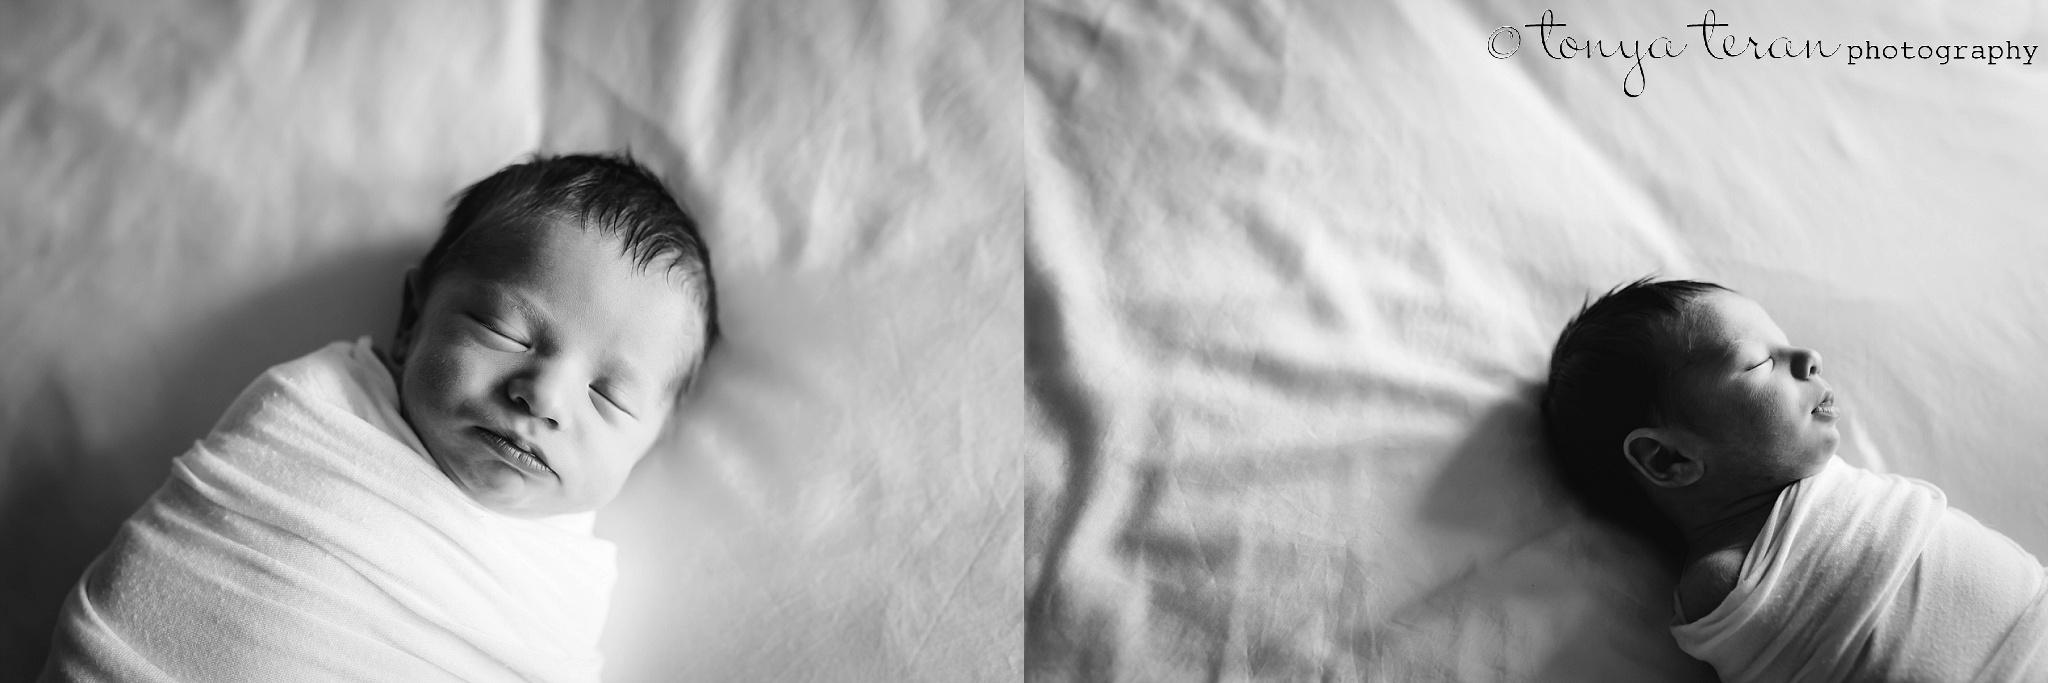 Newborn Family Photo Session | Tonya Teran Photography, Rockville, MD Newborn, Baby, and Family Photographer